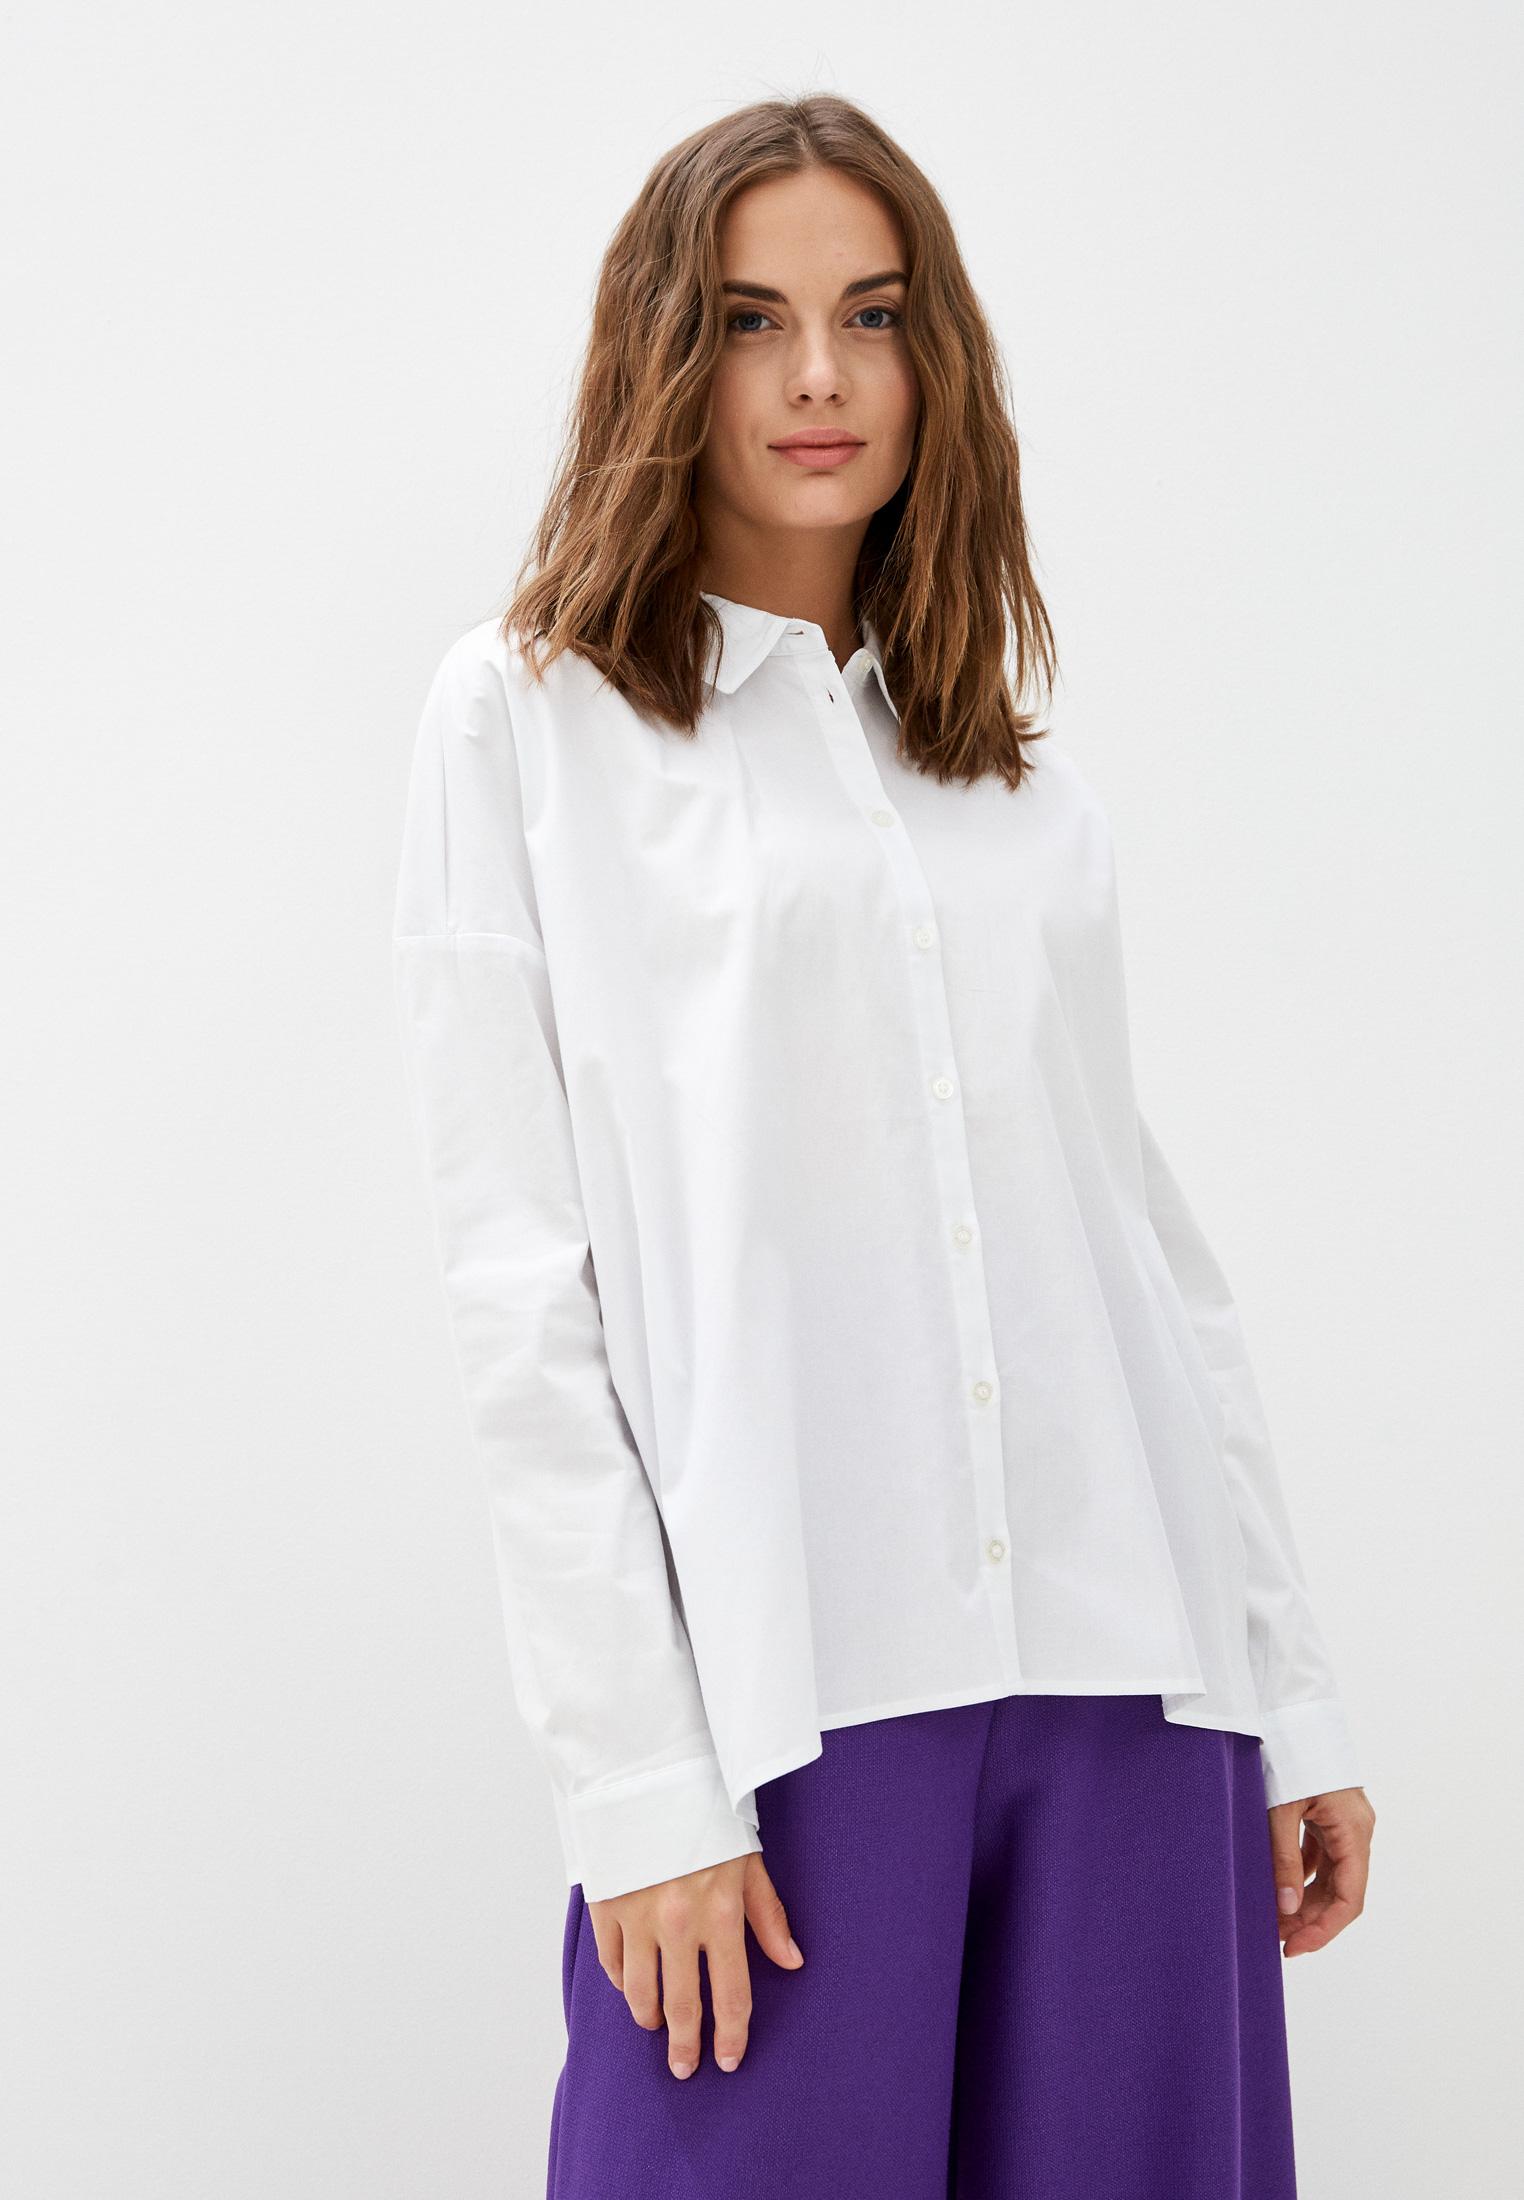 Женские рубашки с длинным рукавом Silvian Heach Рубашка Silvian Heach